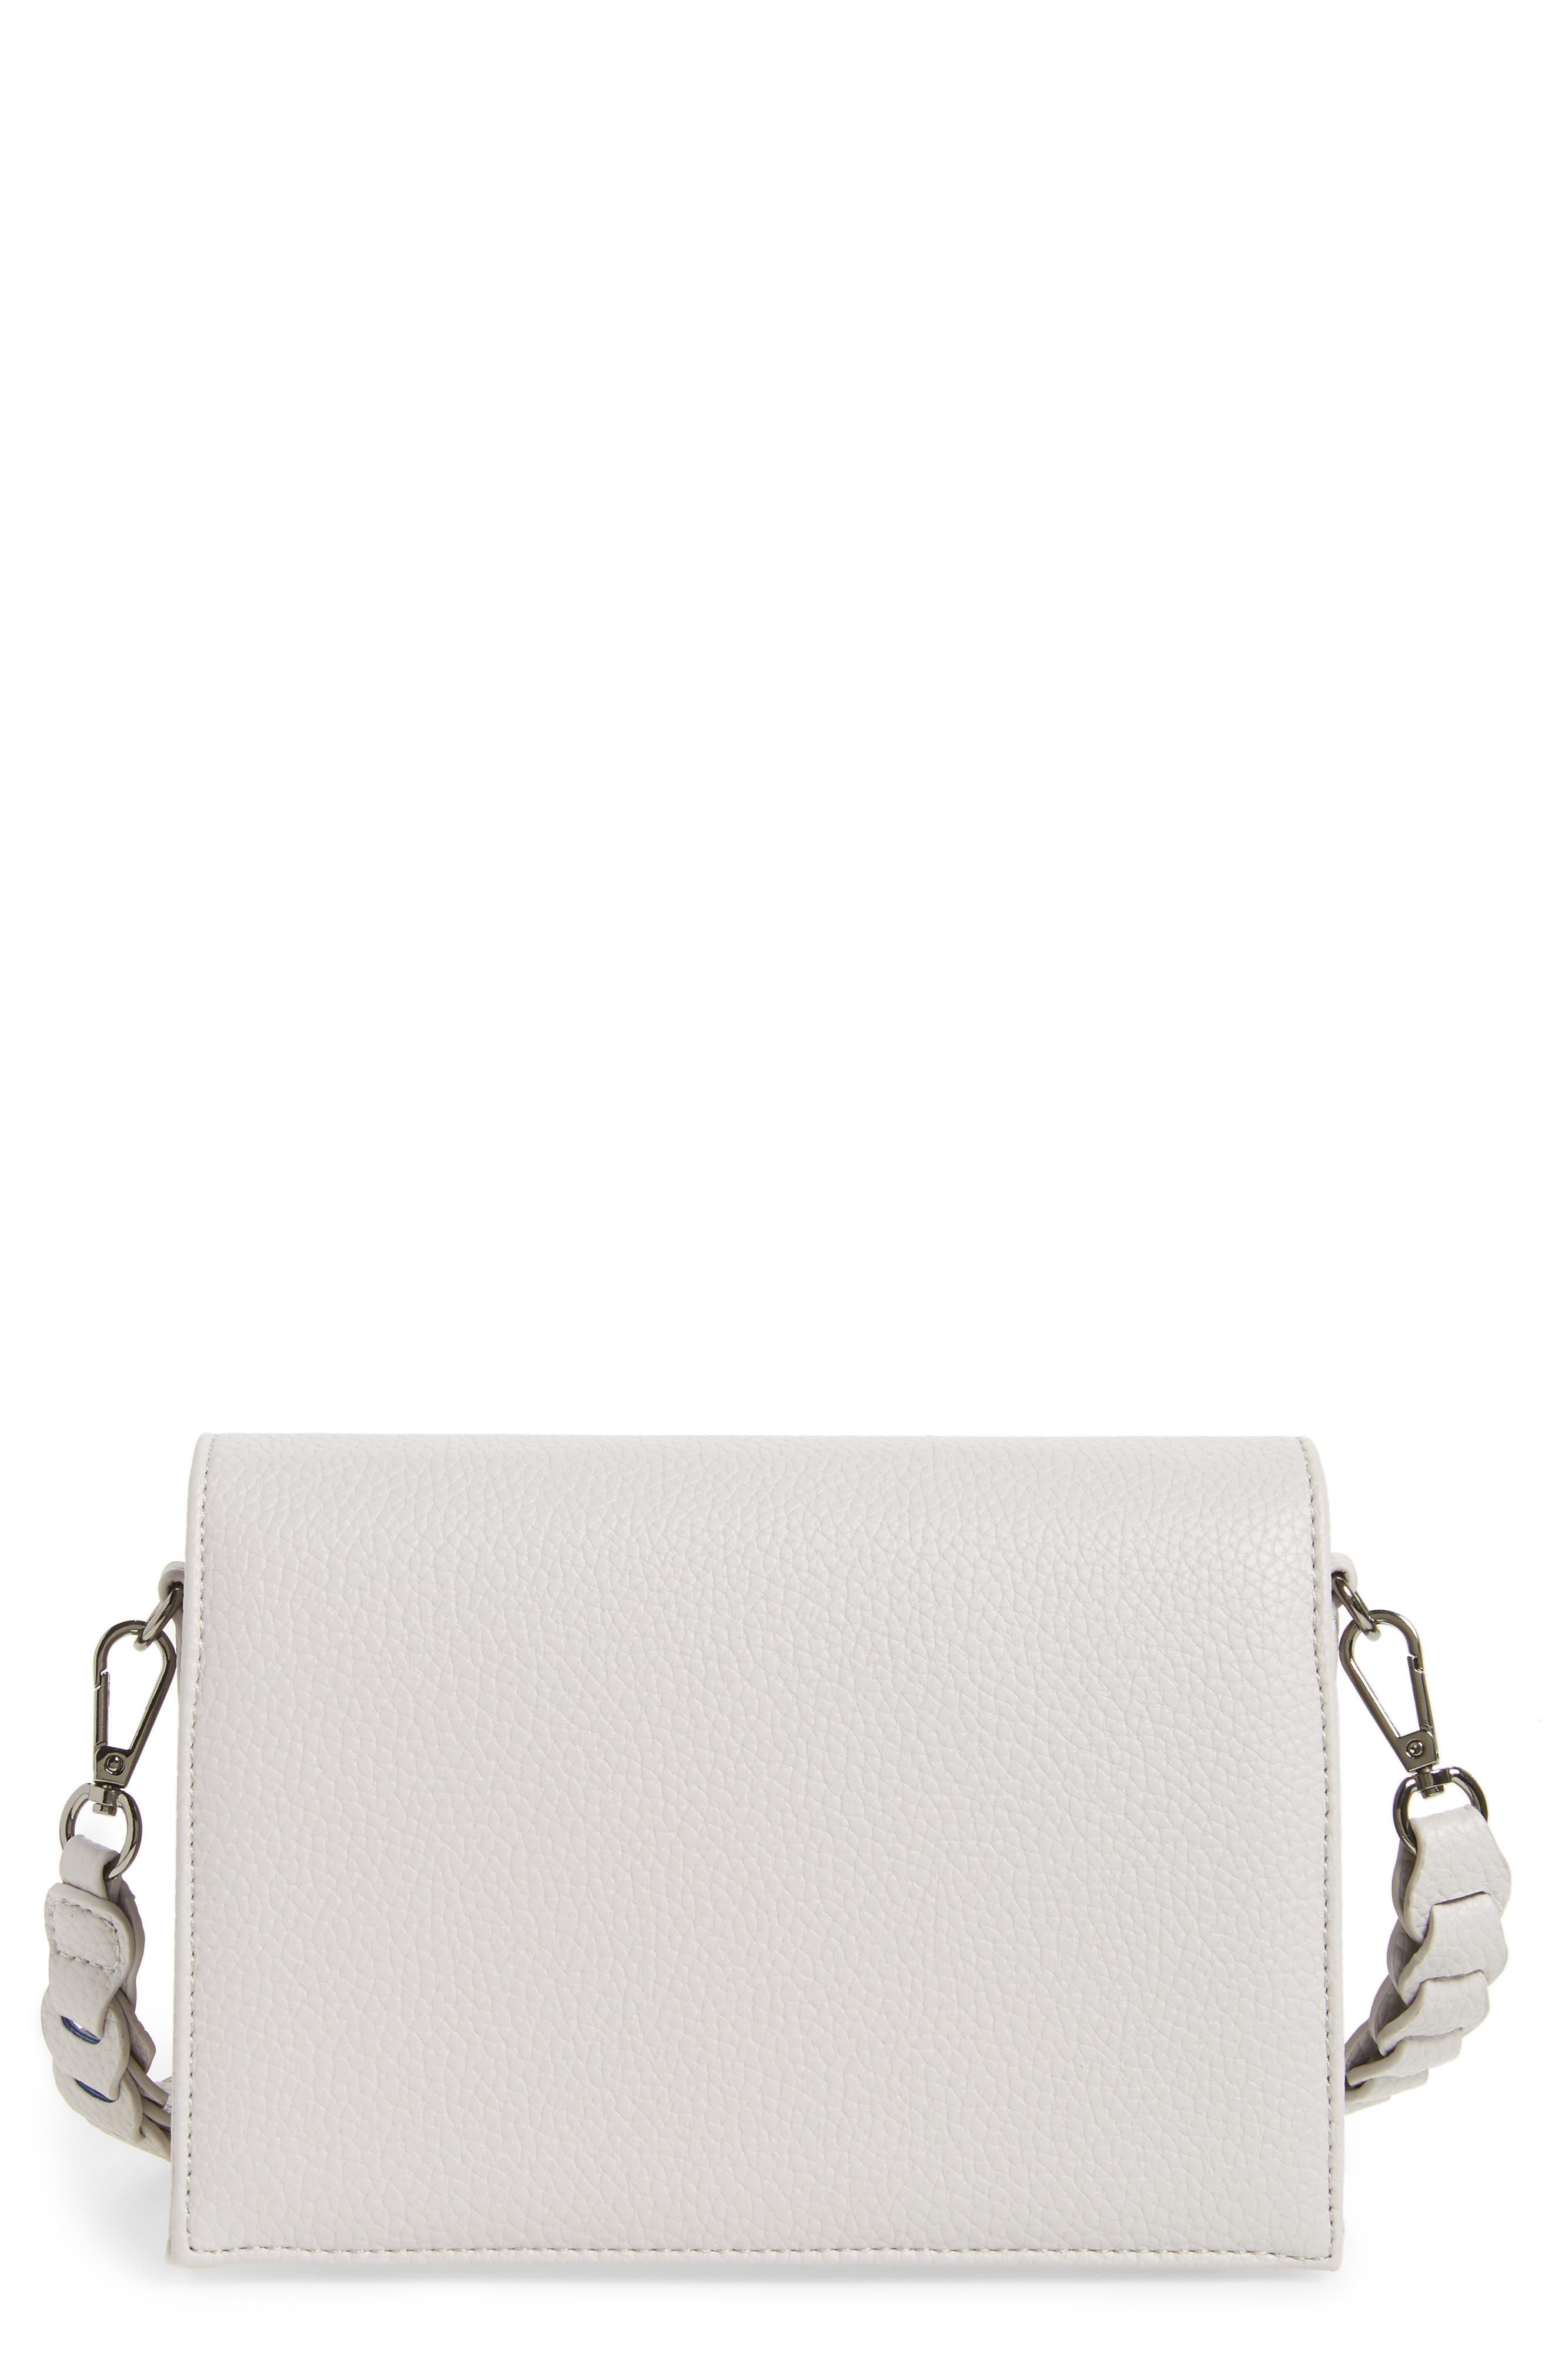 Braided Handle Crossbody Bag, Main, color, 020